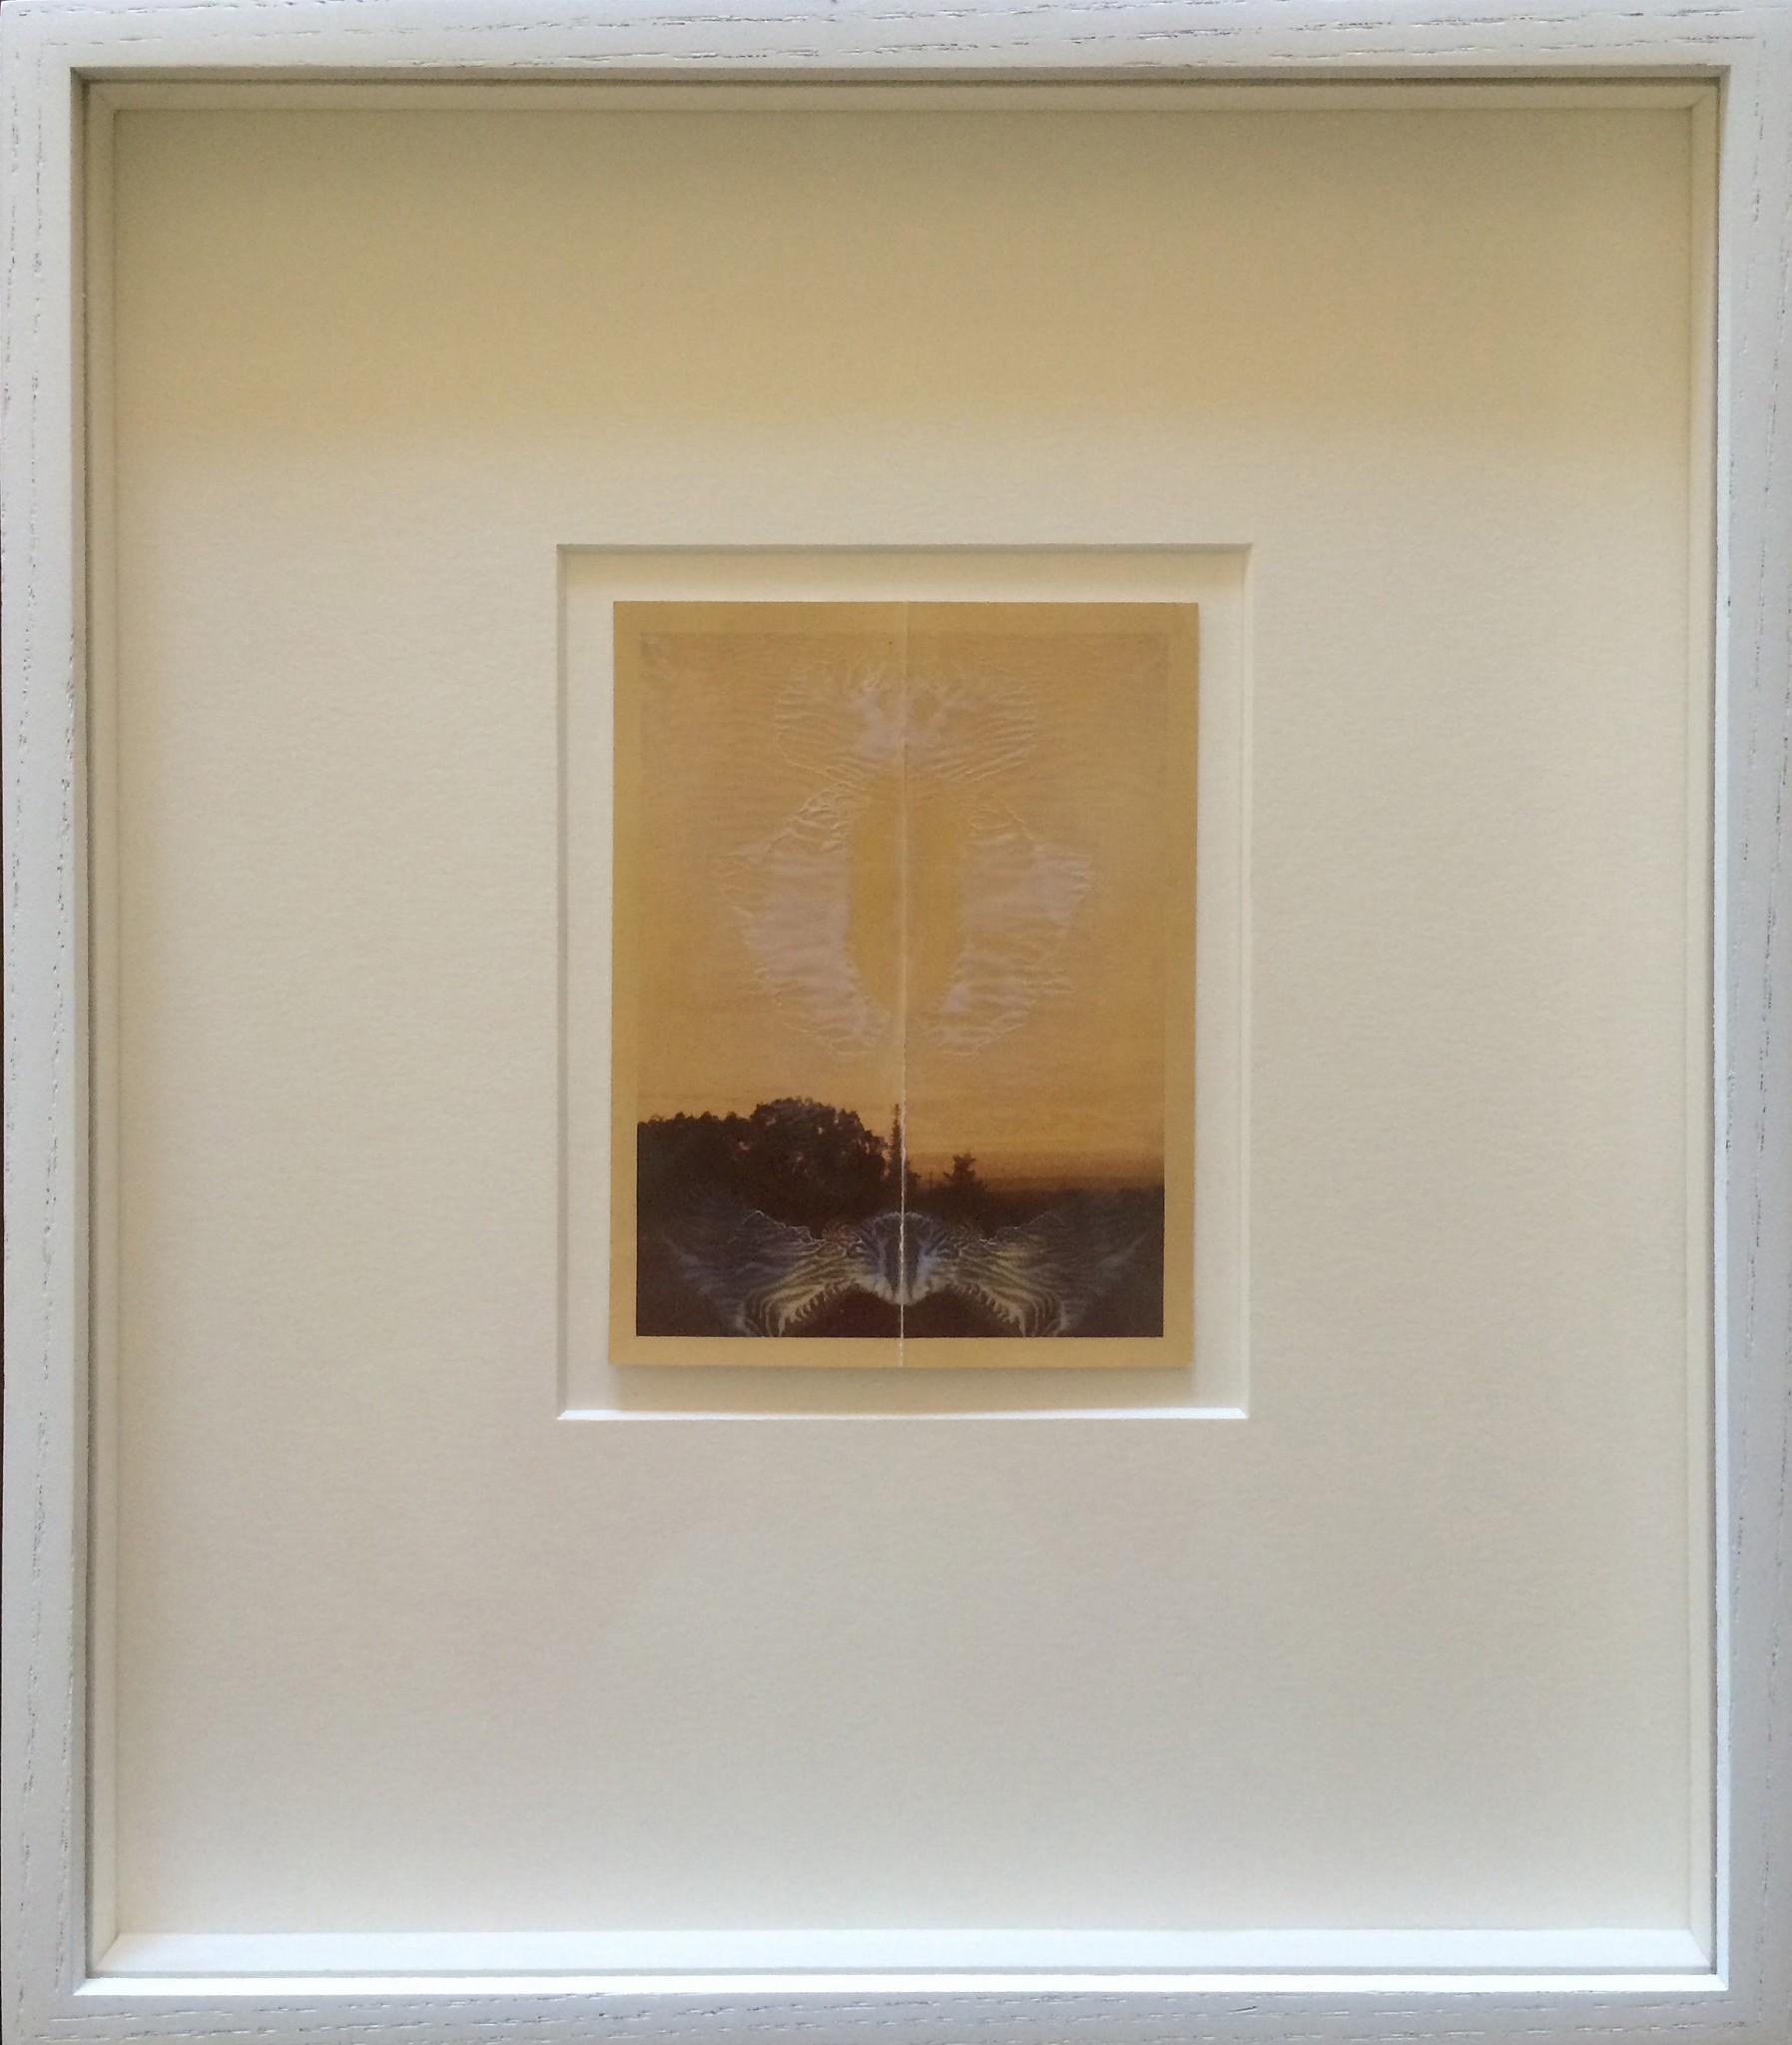 Randi Malkin Steinberger | August 22, 1943 | Sears Peyton Gallery